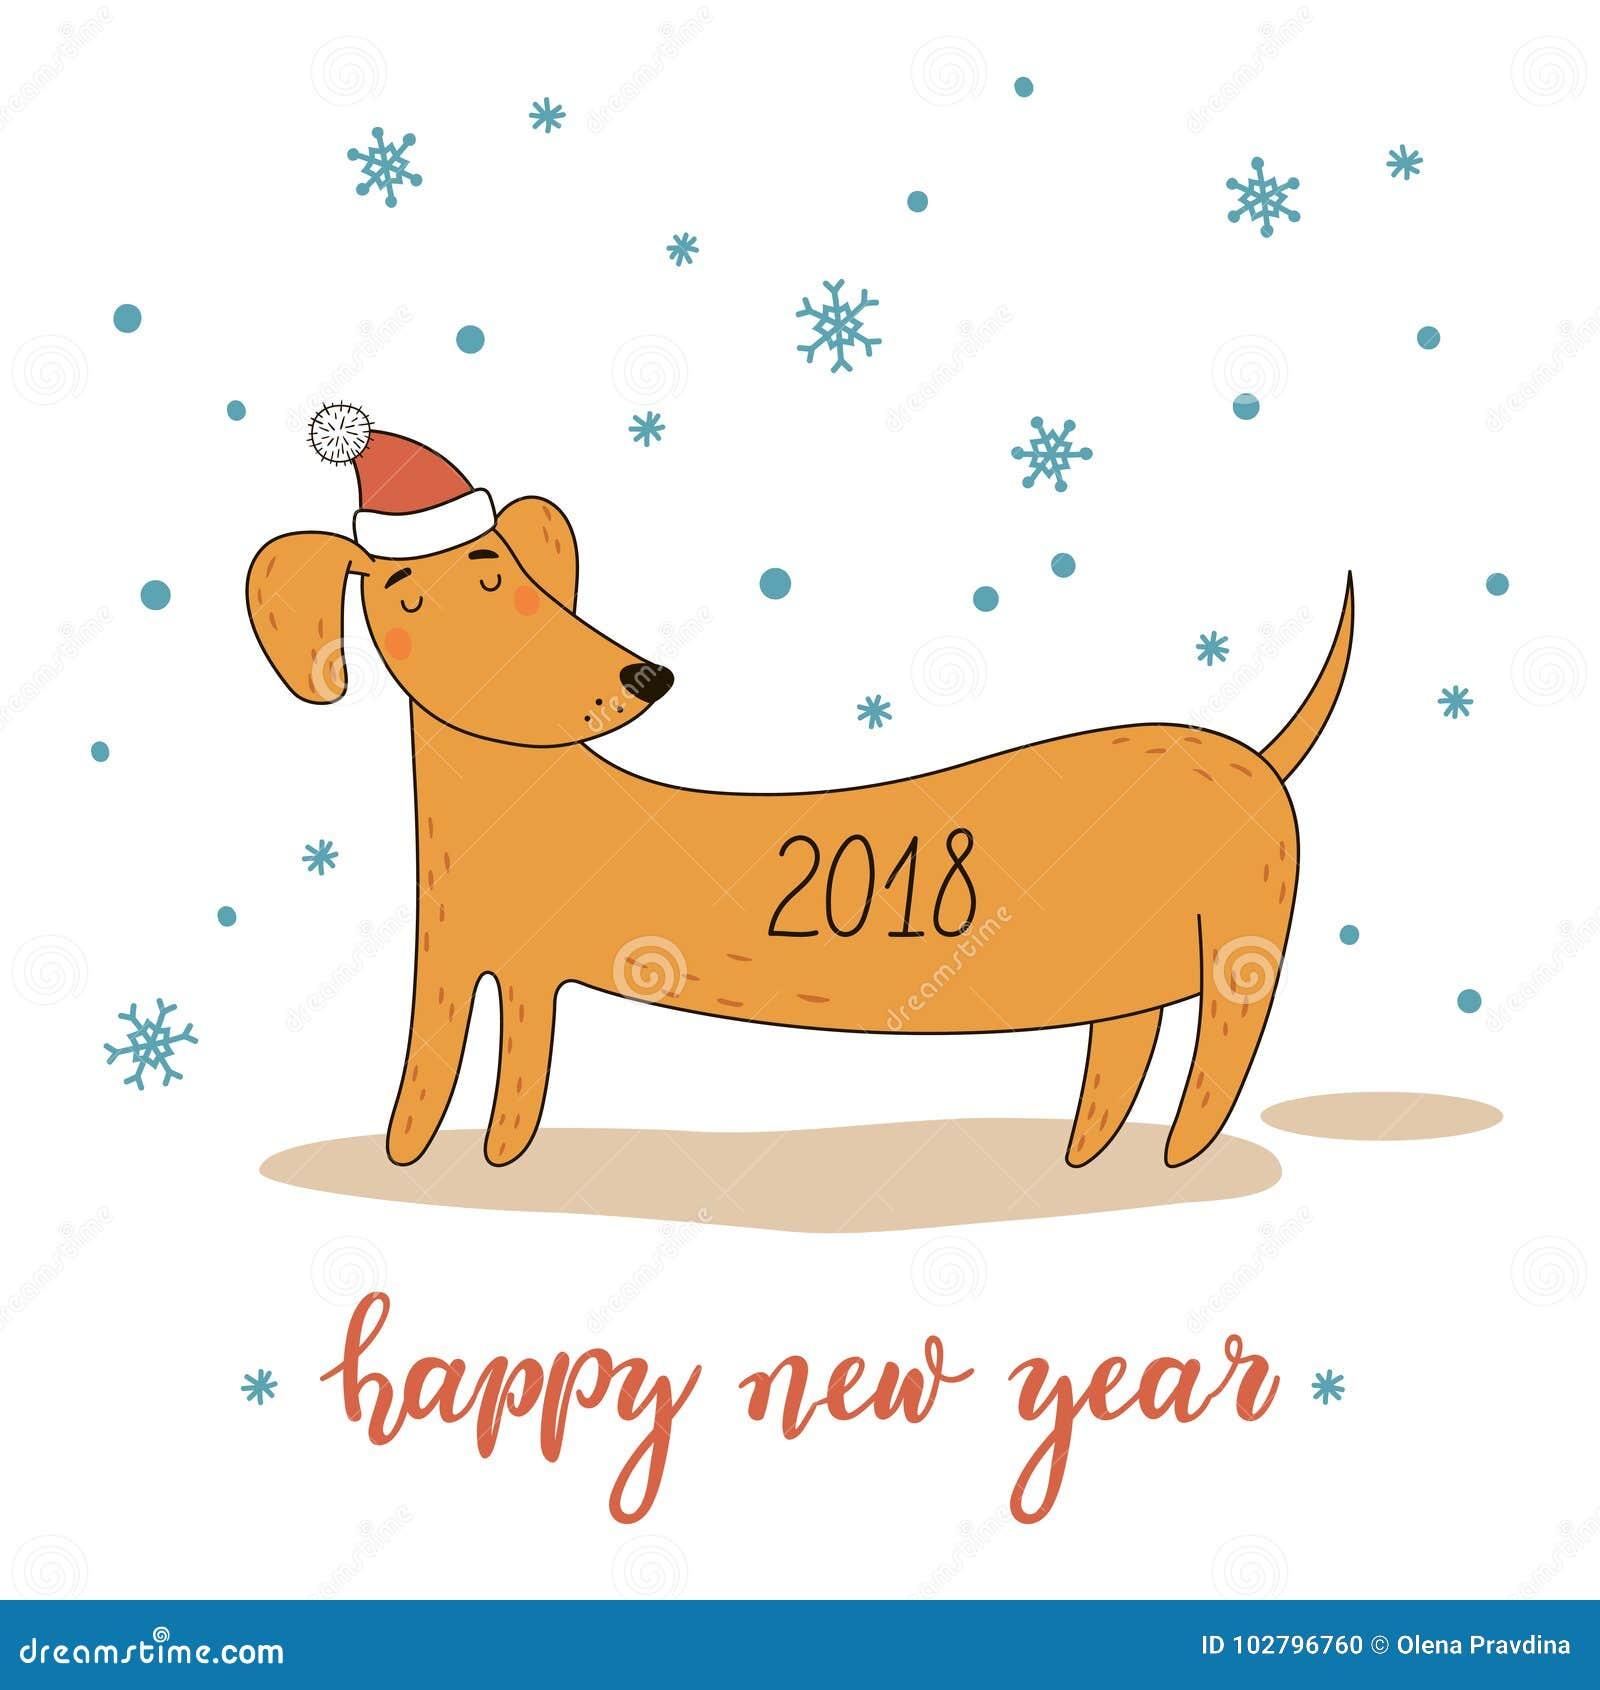 Kerstmis en Nieuwjaargroetkaart met leuke beeldverhaaltekkel Vector illustratie